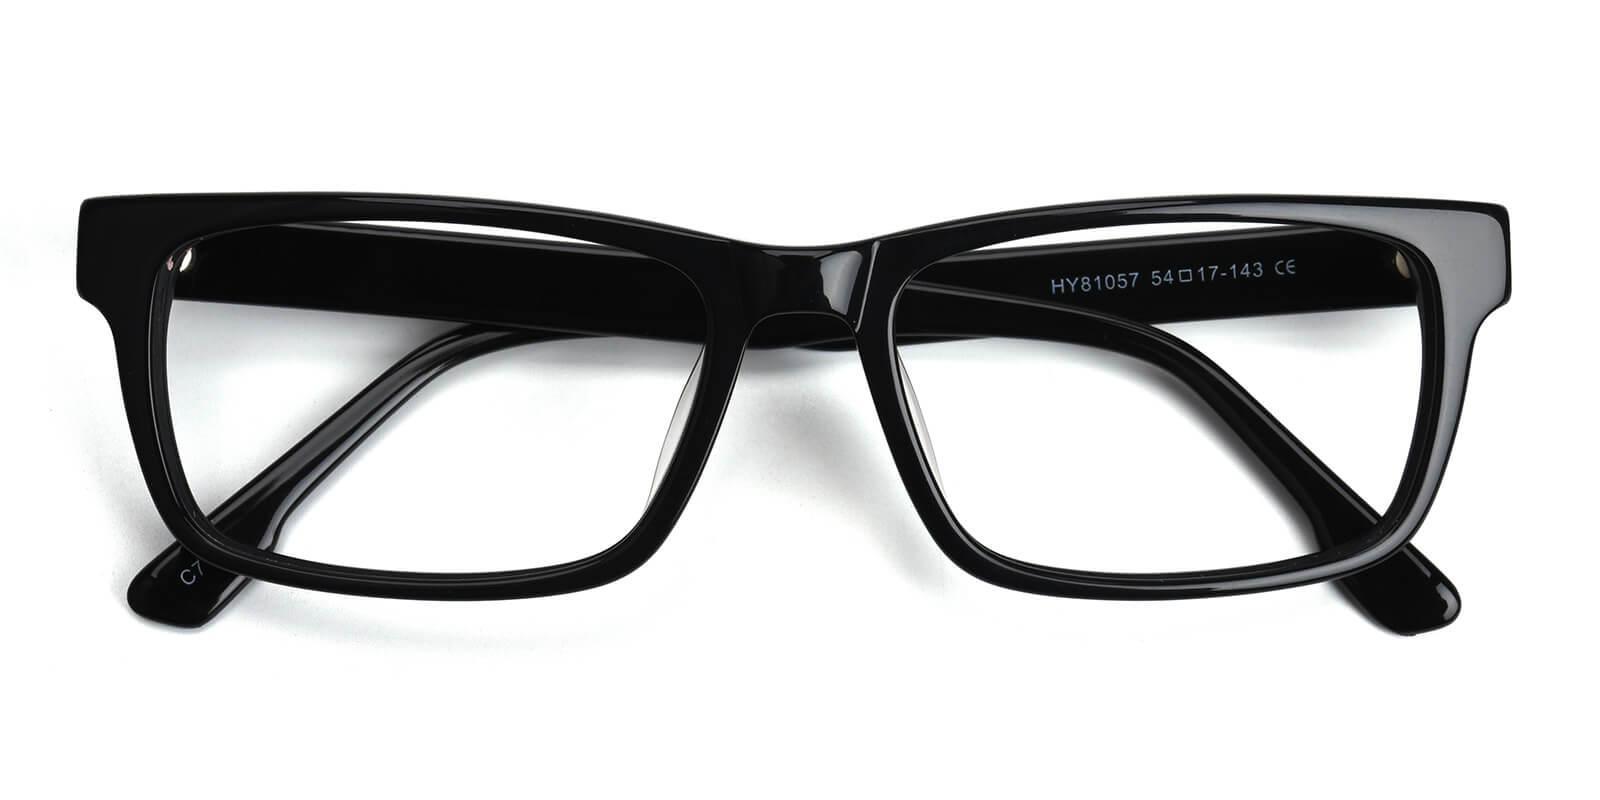 Obsidian-Black-Rectangle-Acetate-Eyeglasses-detail